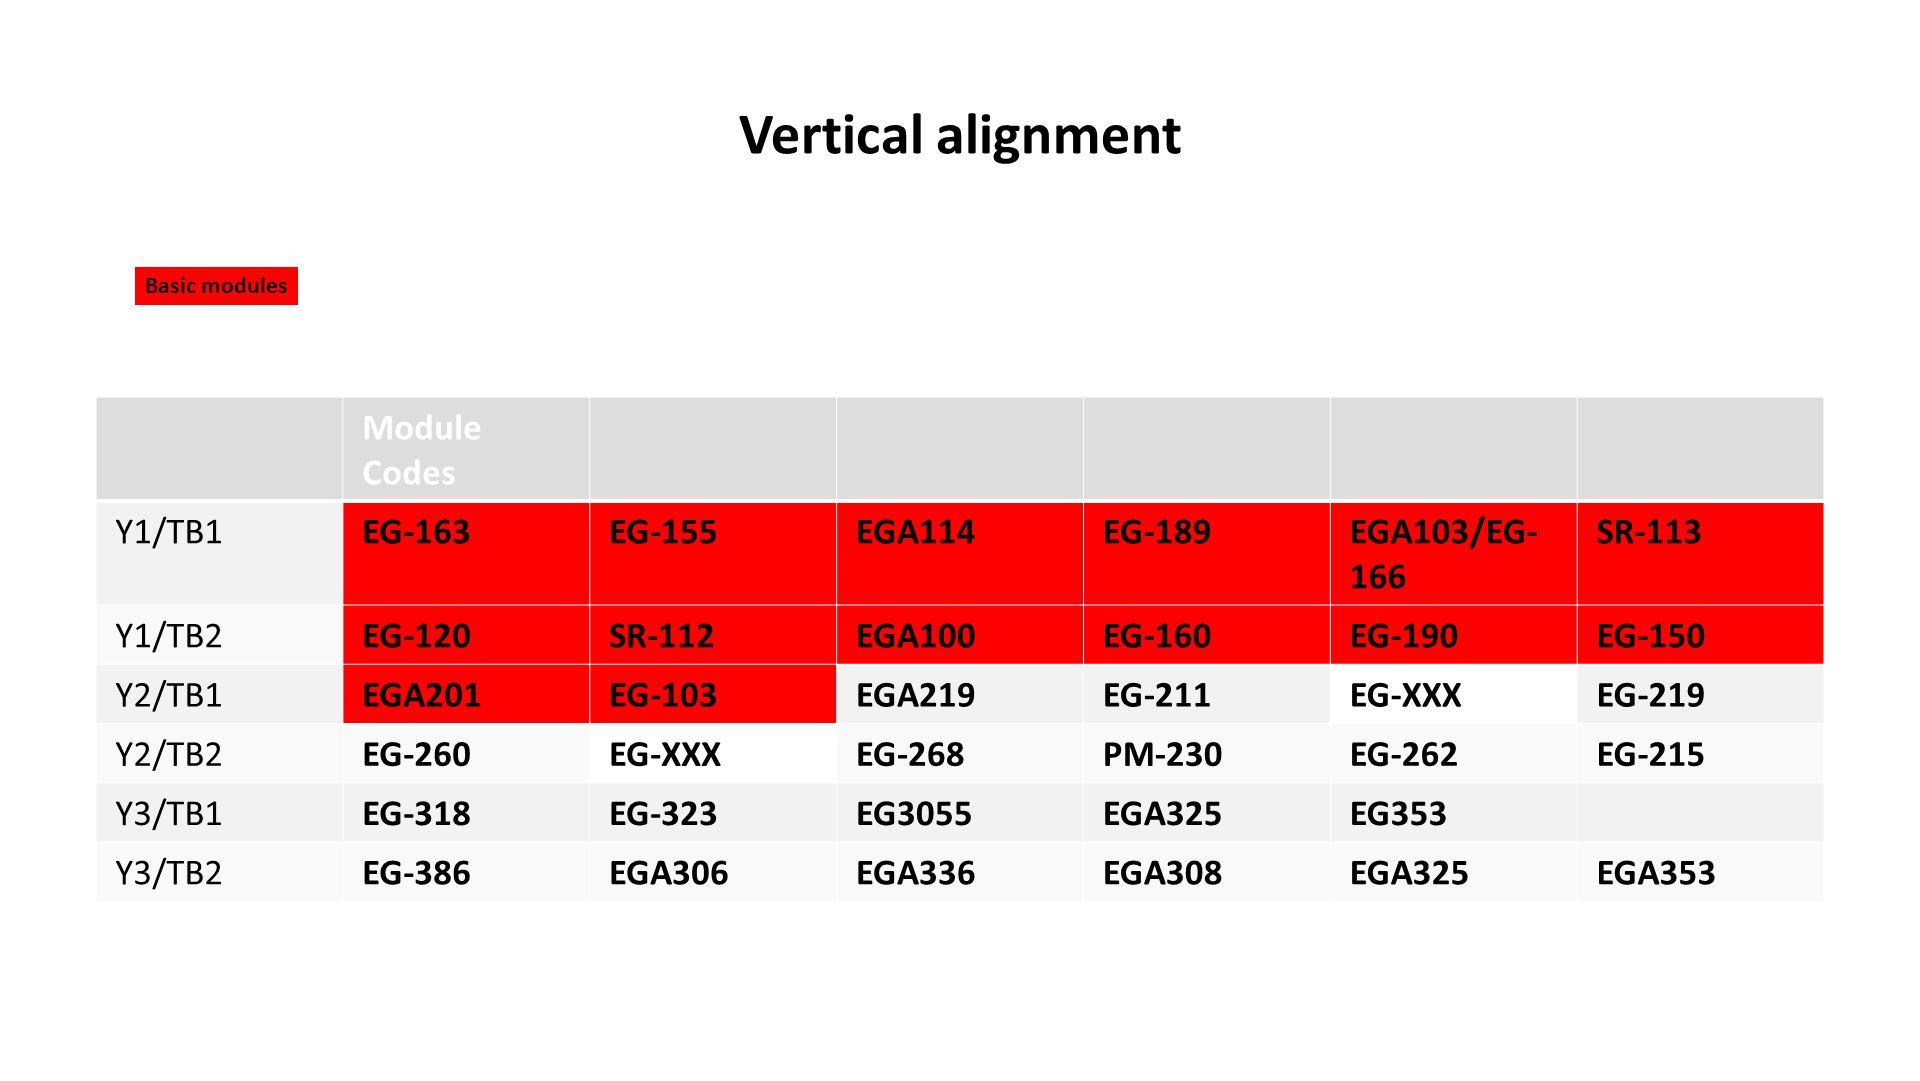 Vertical alignment Module Codes Y1/TB1EG-163EG-155EGA114EG-189EGA103/EG- 166 SR-113 Y1/TB2EG-120SR-112EGA100EG-160EG-190EG-150 Y2/TB1EGA201EG-103EGA219EG-211EG-XXXEG-219 Y2/TB2EG-260EG-XXXEG-268PM-230EG-262EG-215 Y3/TB1EG-318EG-323EG3055EGA325EG353 Y3/TB2EG-386EGA306EGA336EGA308EGA325EGA353 Basic modules